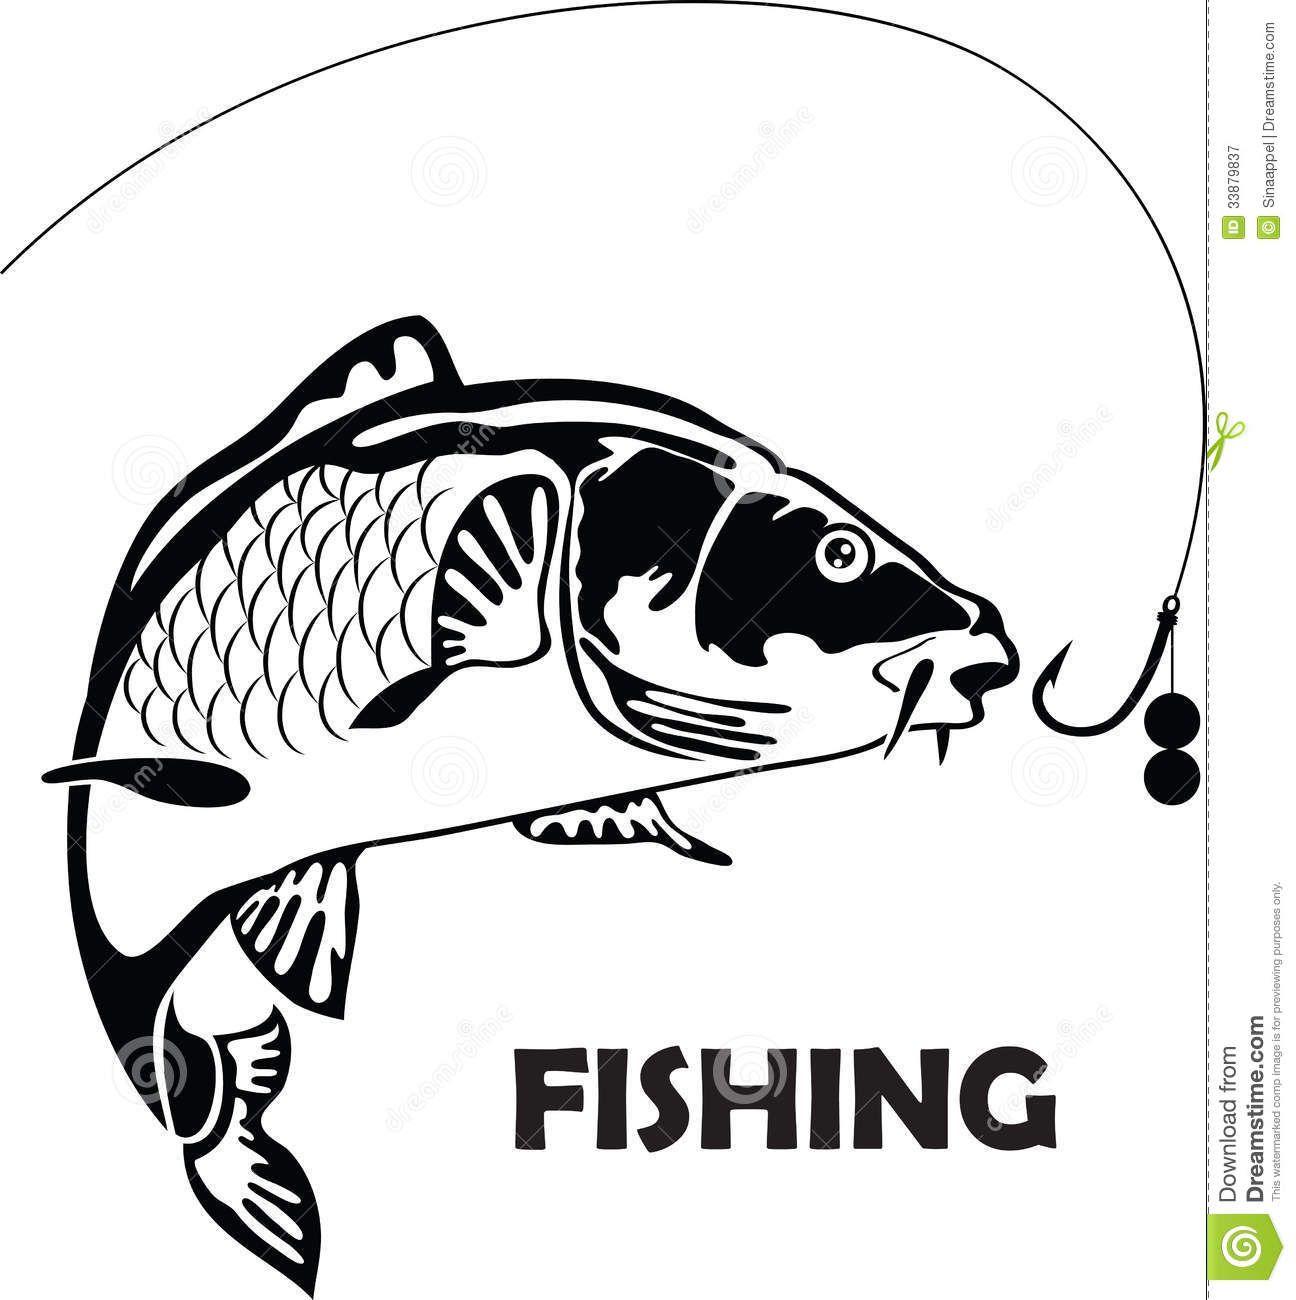 Carp fishing simulator for android download apk free.